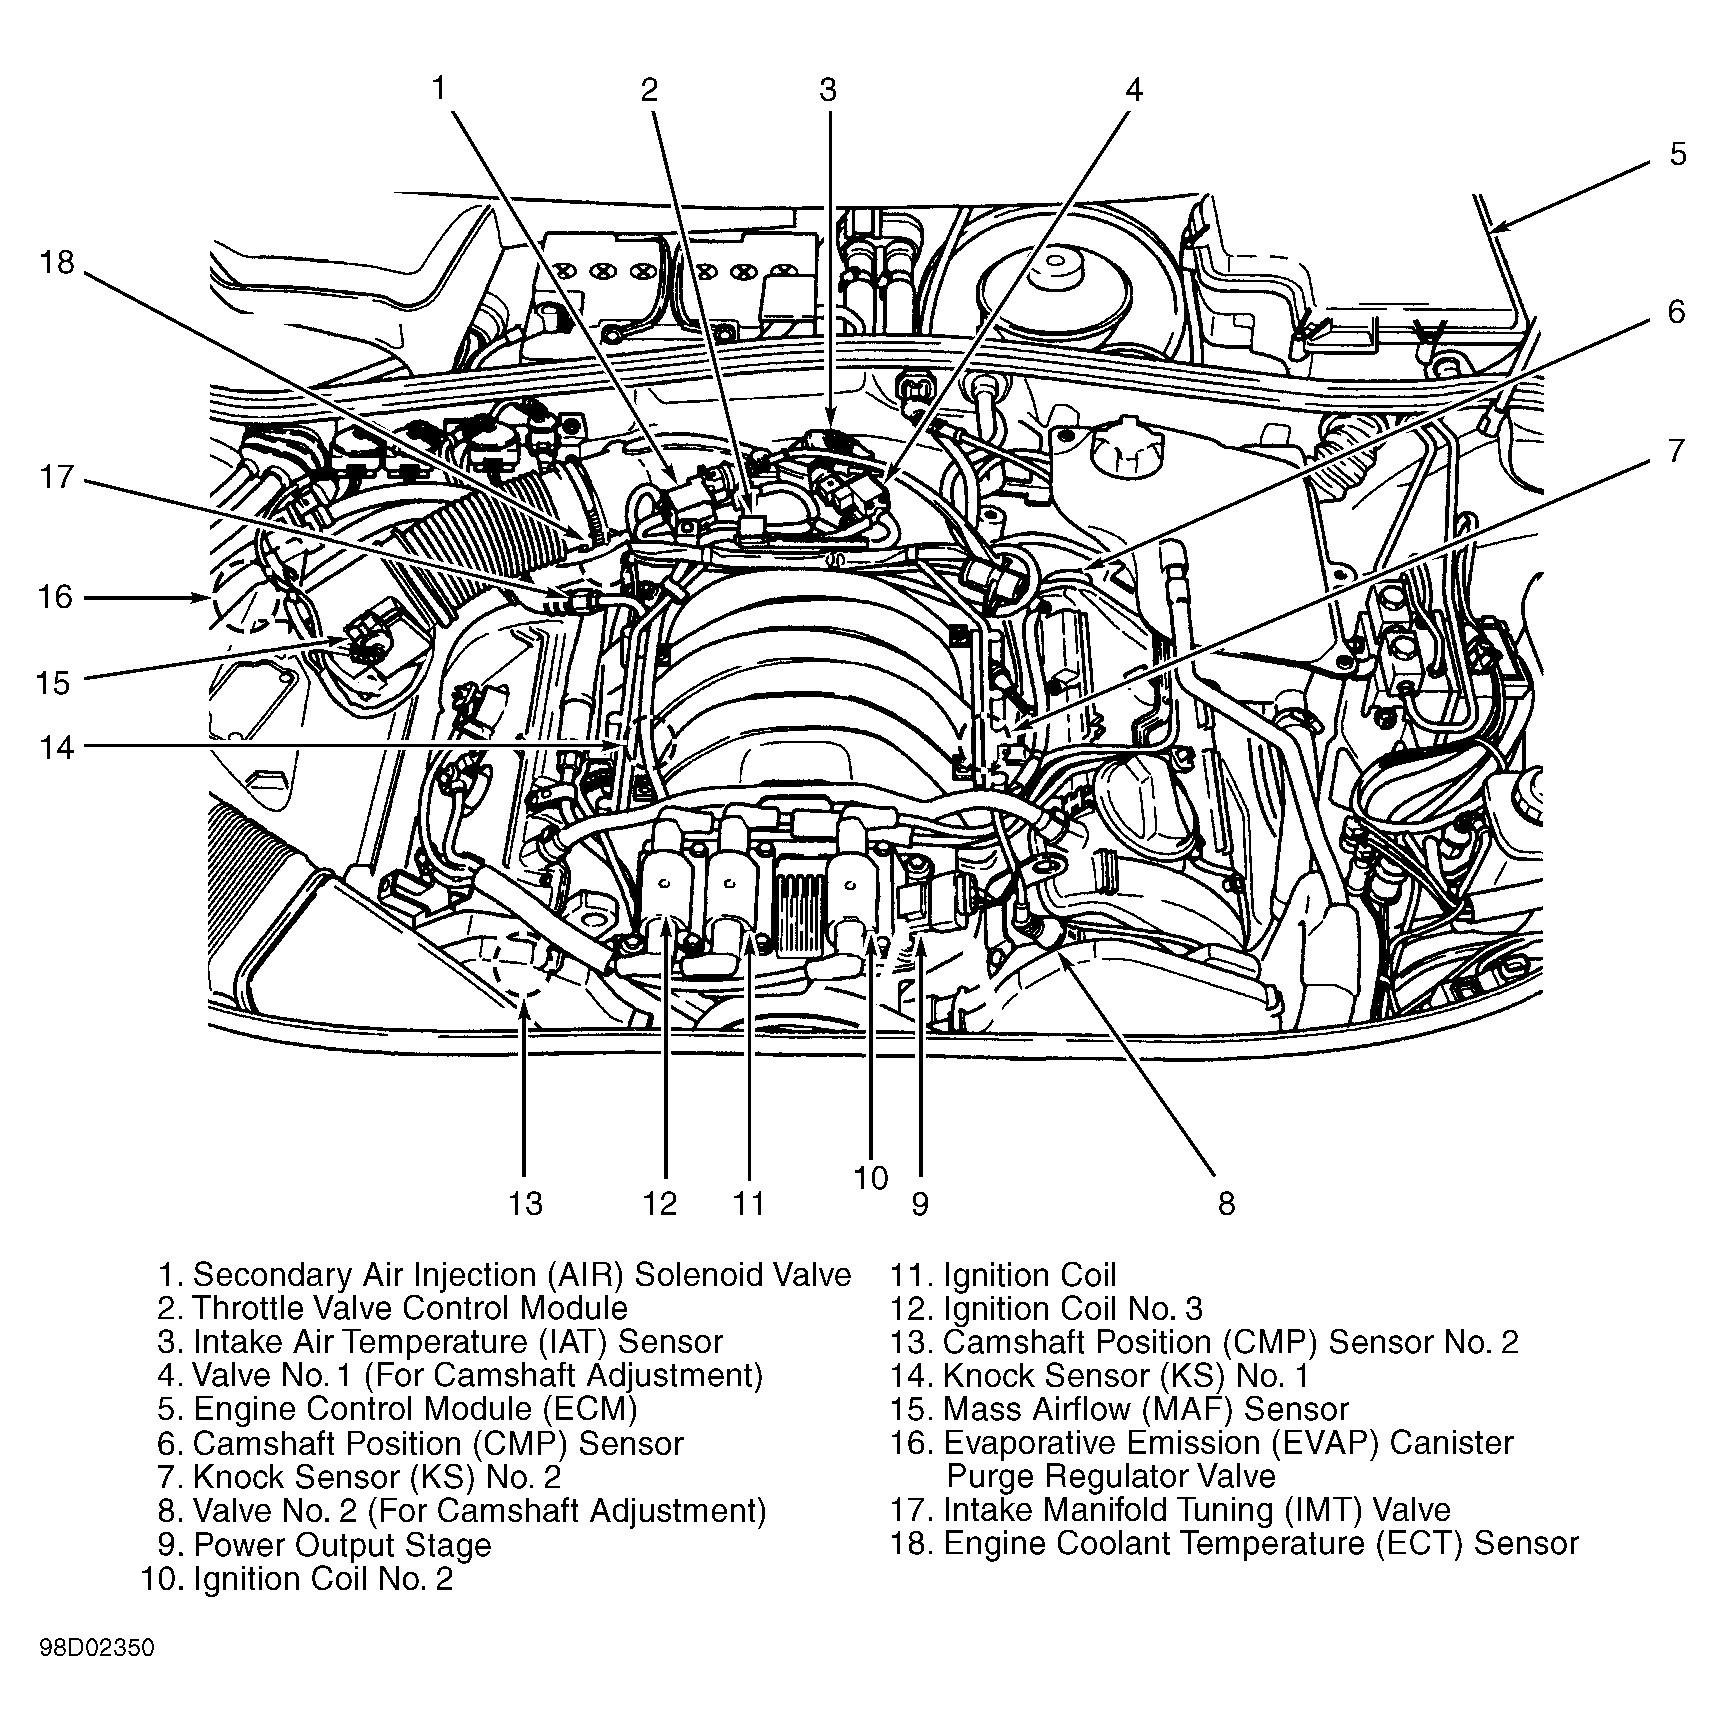 Ready Remote 24921 Wiring Diagram 2005 Dodge Grand Caravan